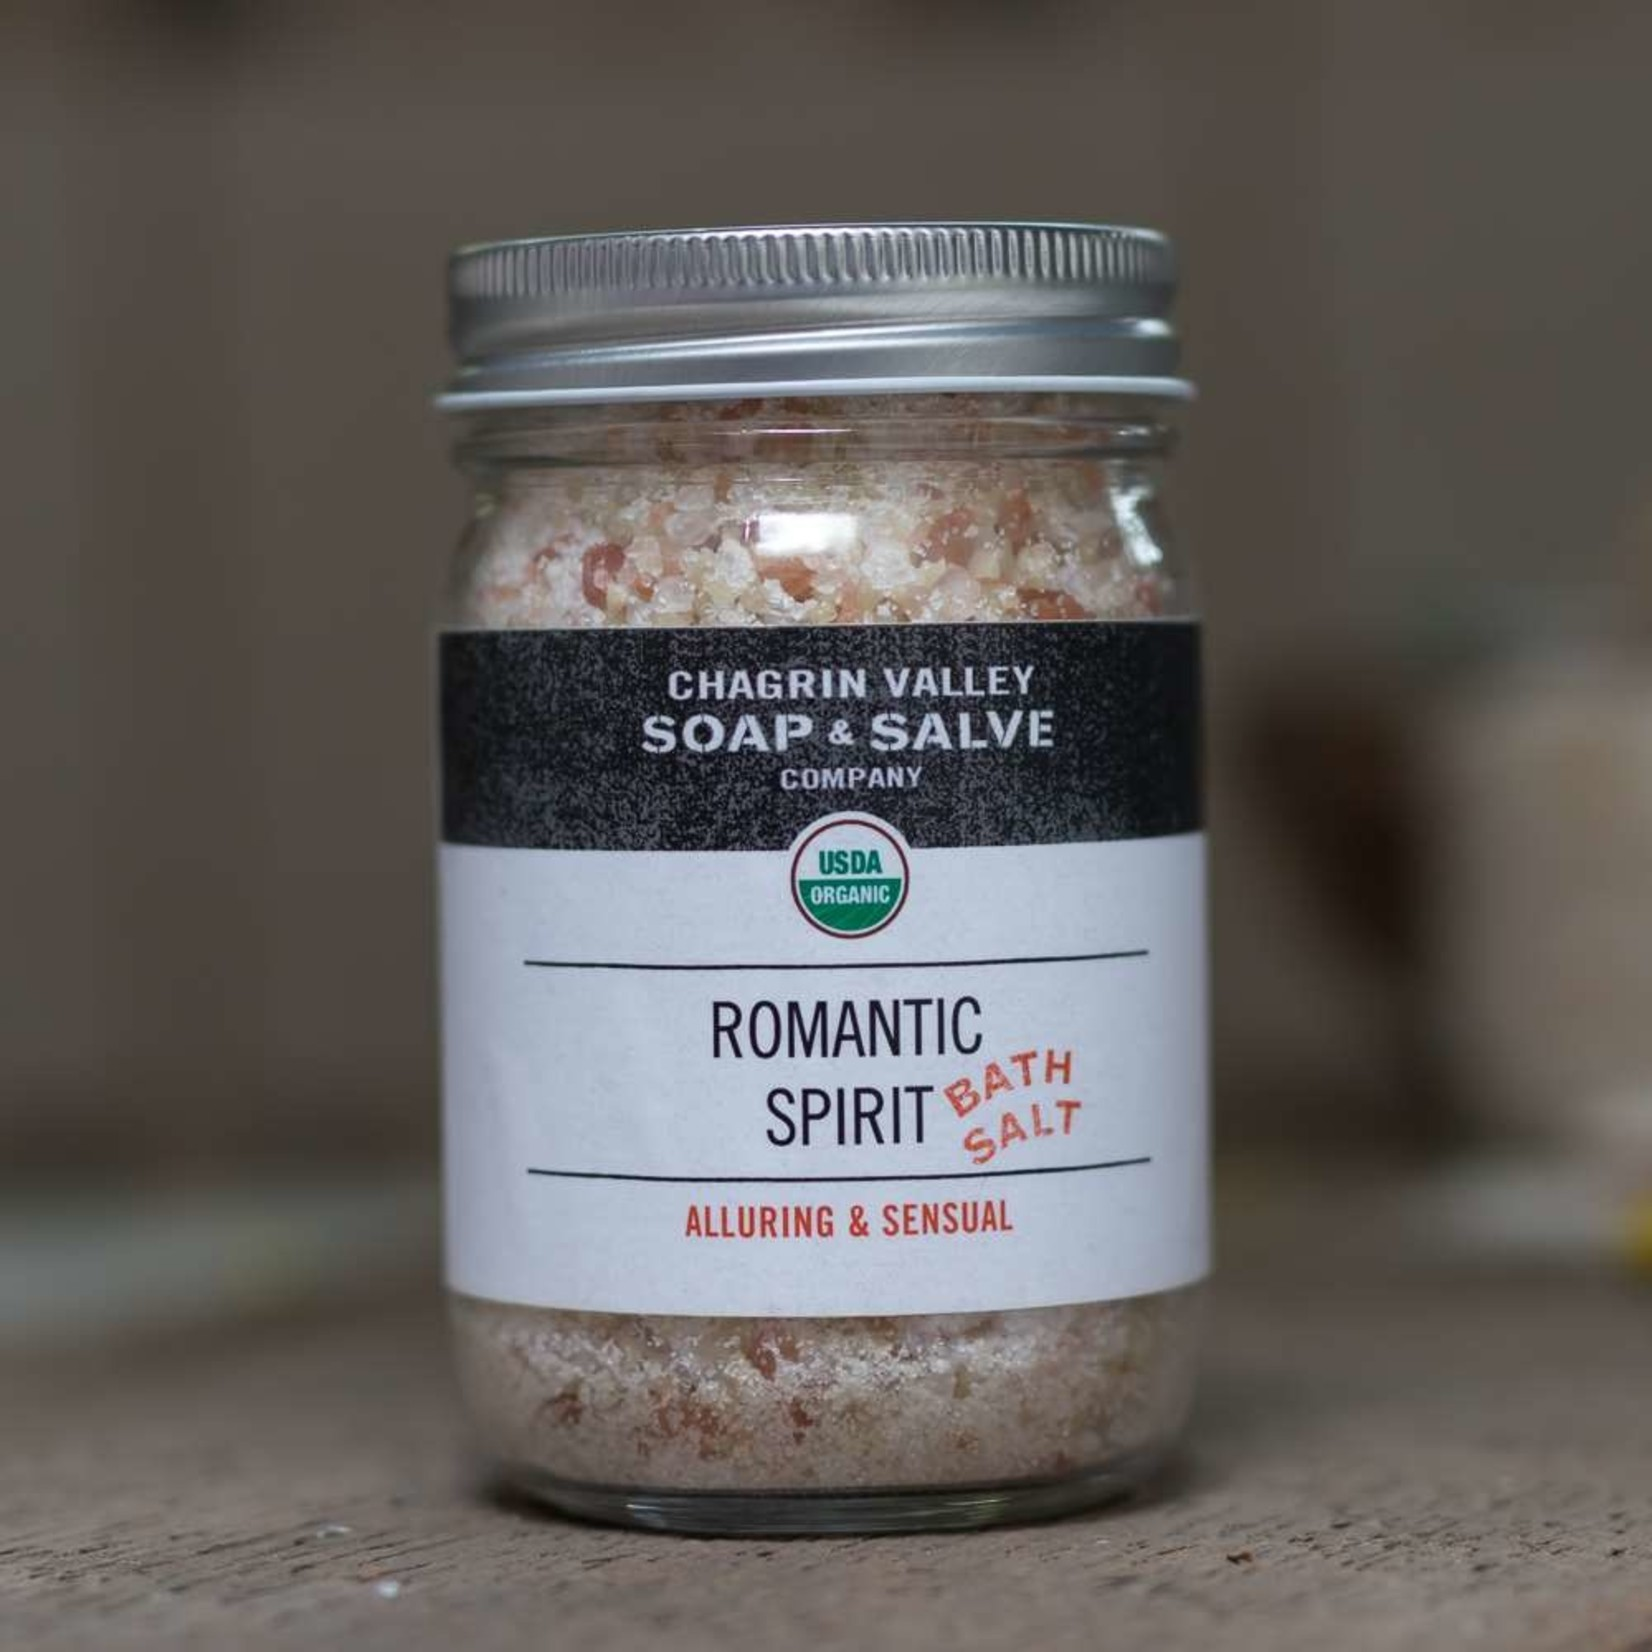 Chagrin Valley Soap and Salve Romantic Spirit Bath Salts